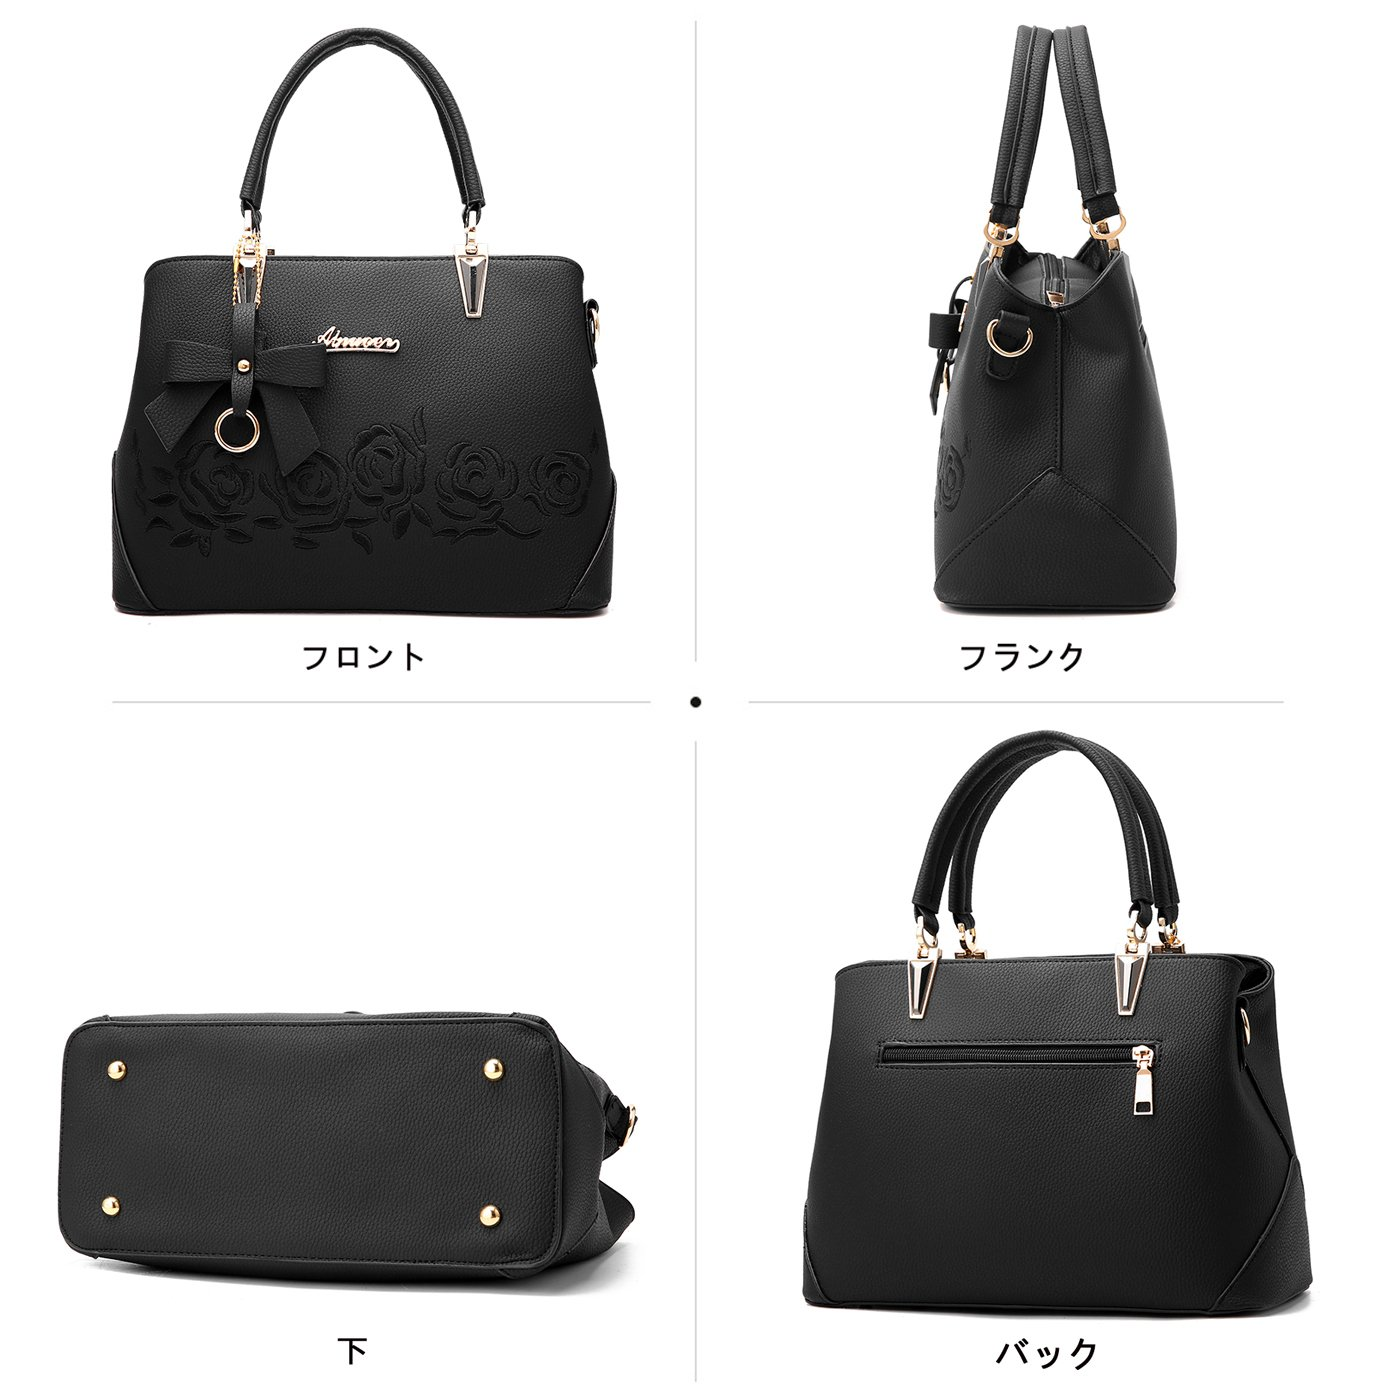 f8c67fe7d041 Amazon | Tisdaini レディース手提げバッグシンプルエンボスおしゃれショルダー斜めがけバッグ女性用バッグ | ハンドバッグ